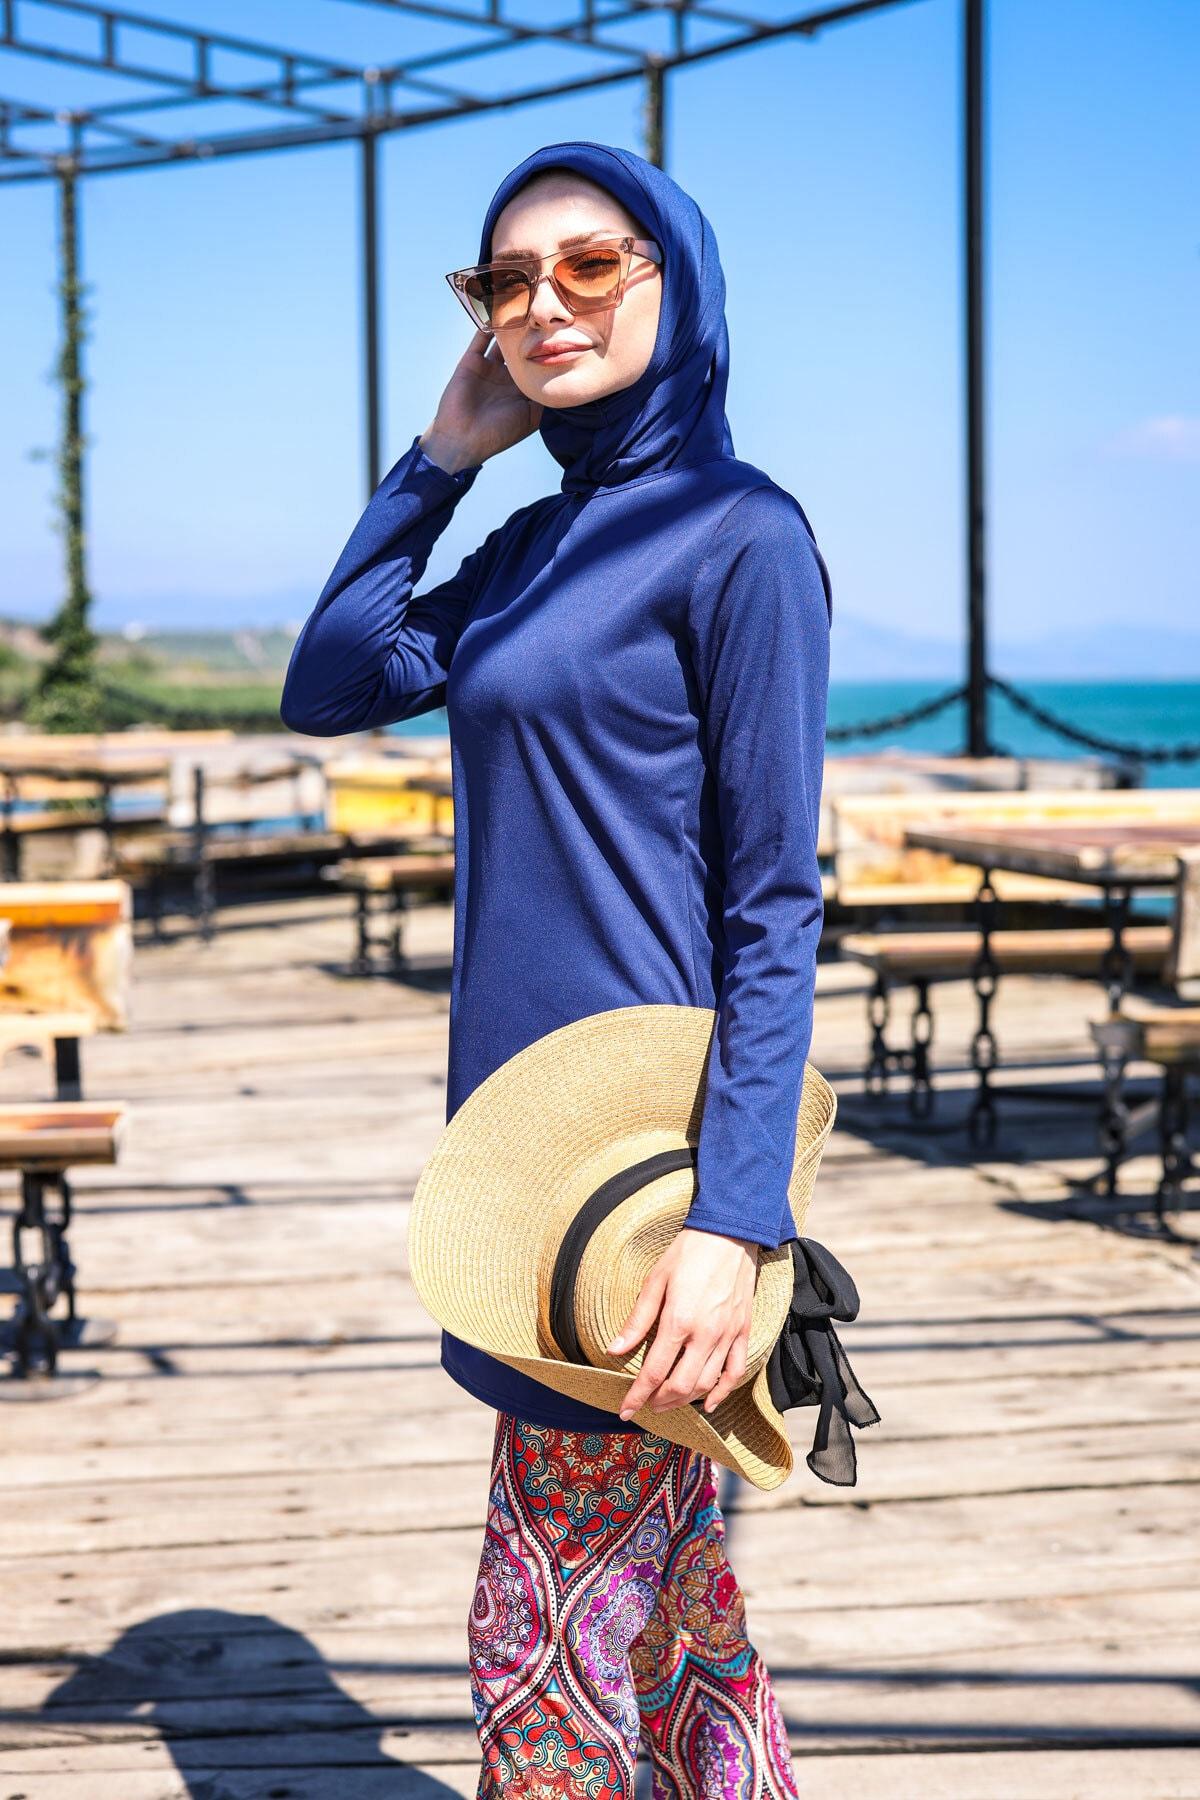 Marina Desenli Tayt Modelli Tam Kapalı Tesettür Mayo R1009 Lacivert